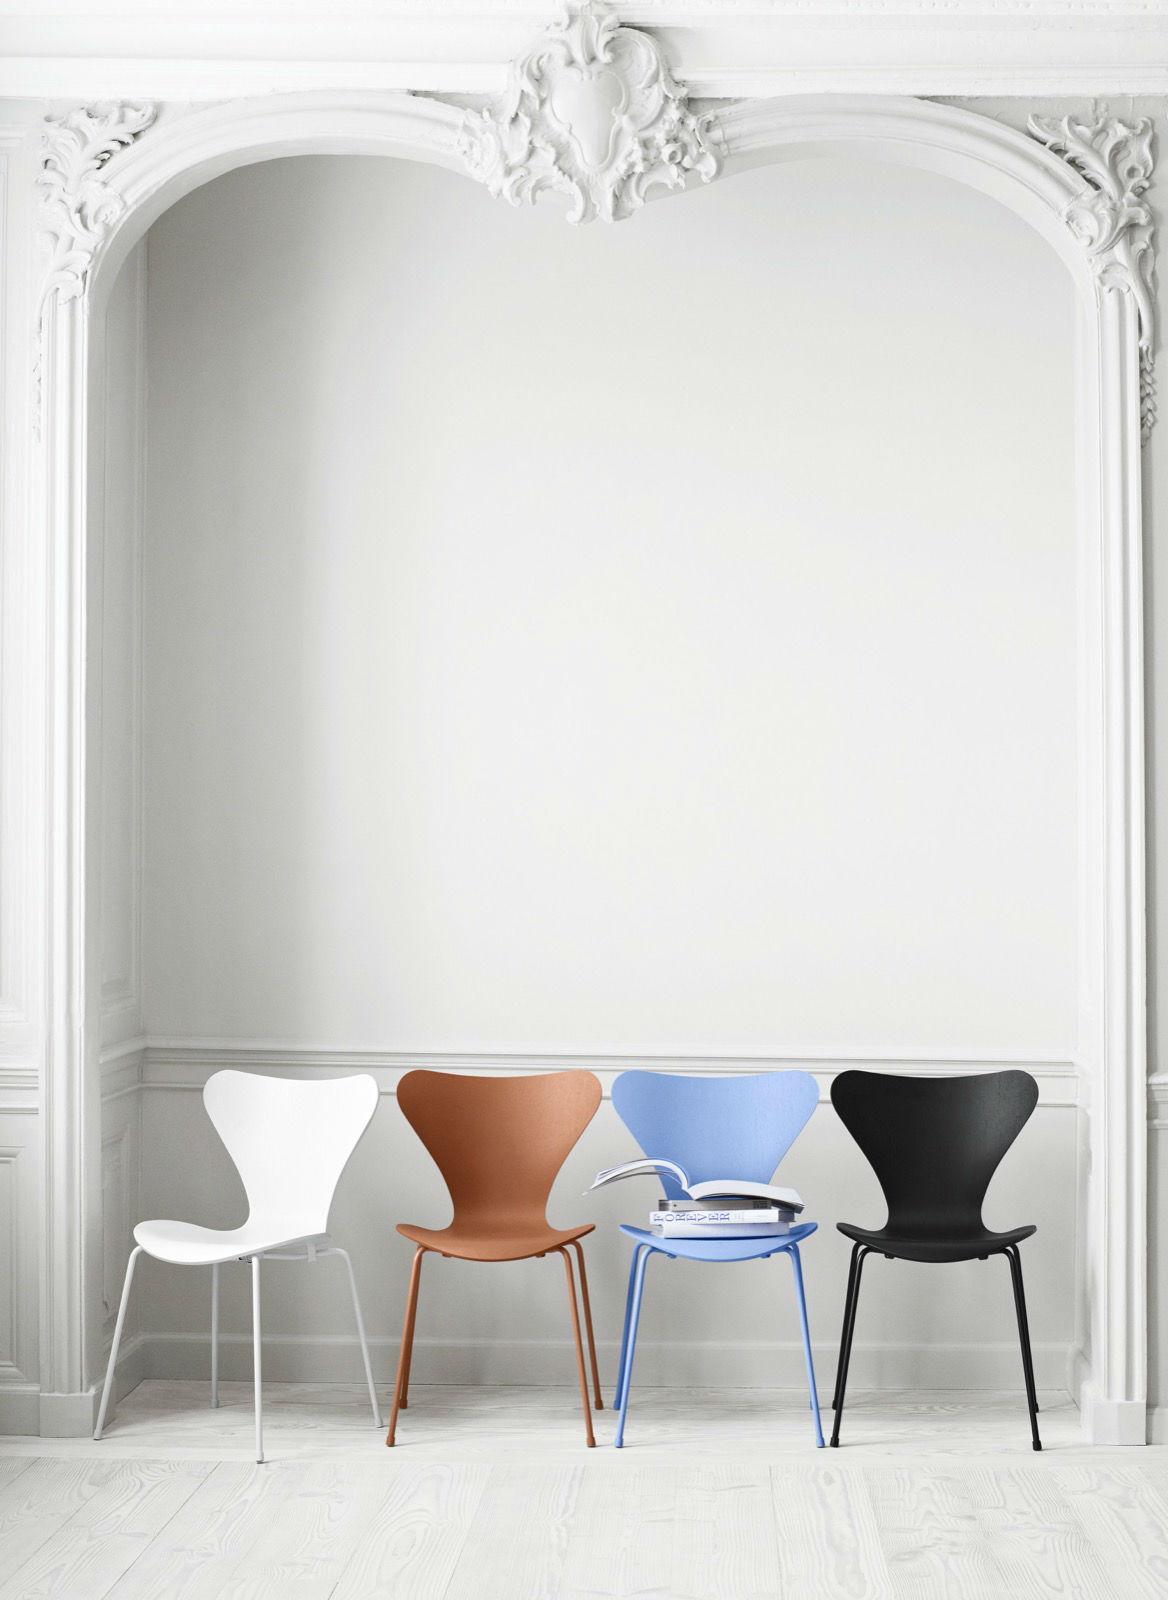 fritz hansen vlinderstoel 3107 matser wageningen. Black Bedroom Furniture Sets. Home Design Ideas